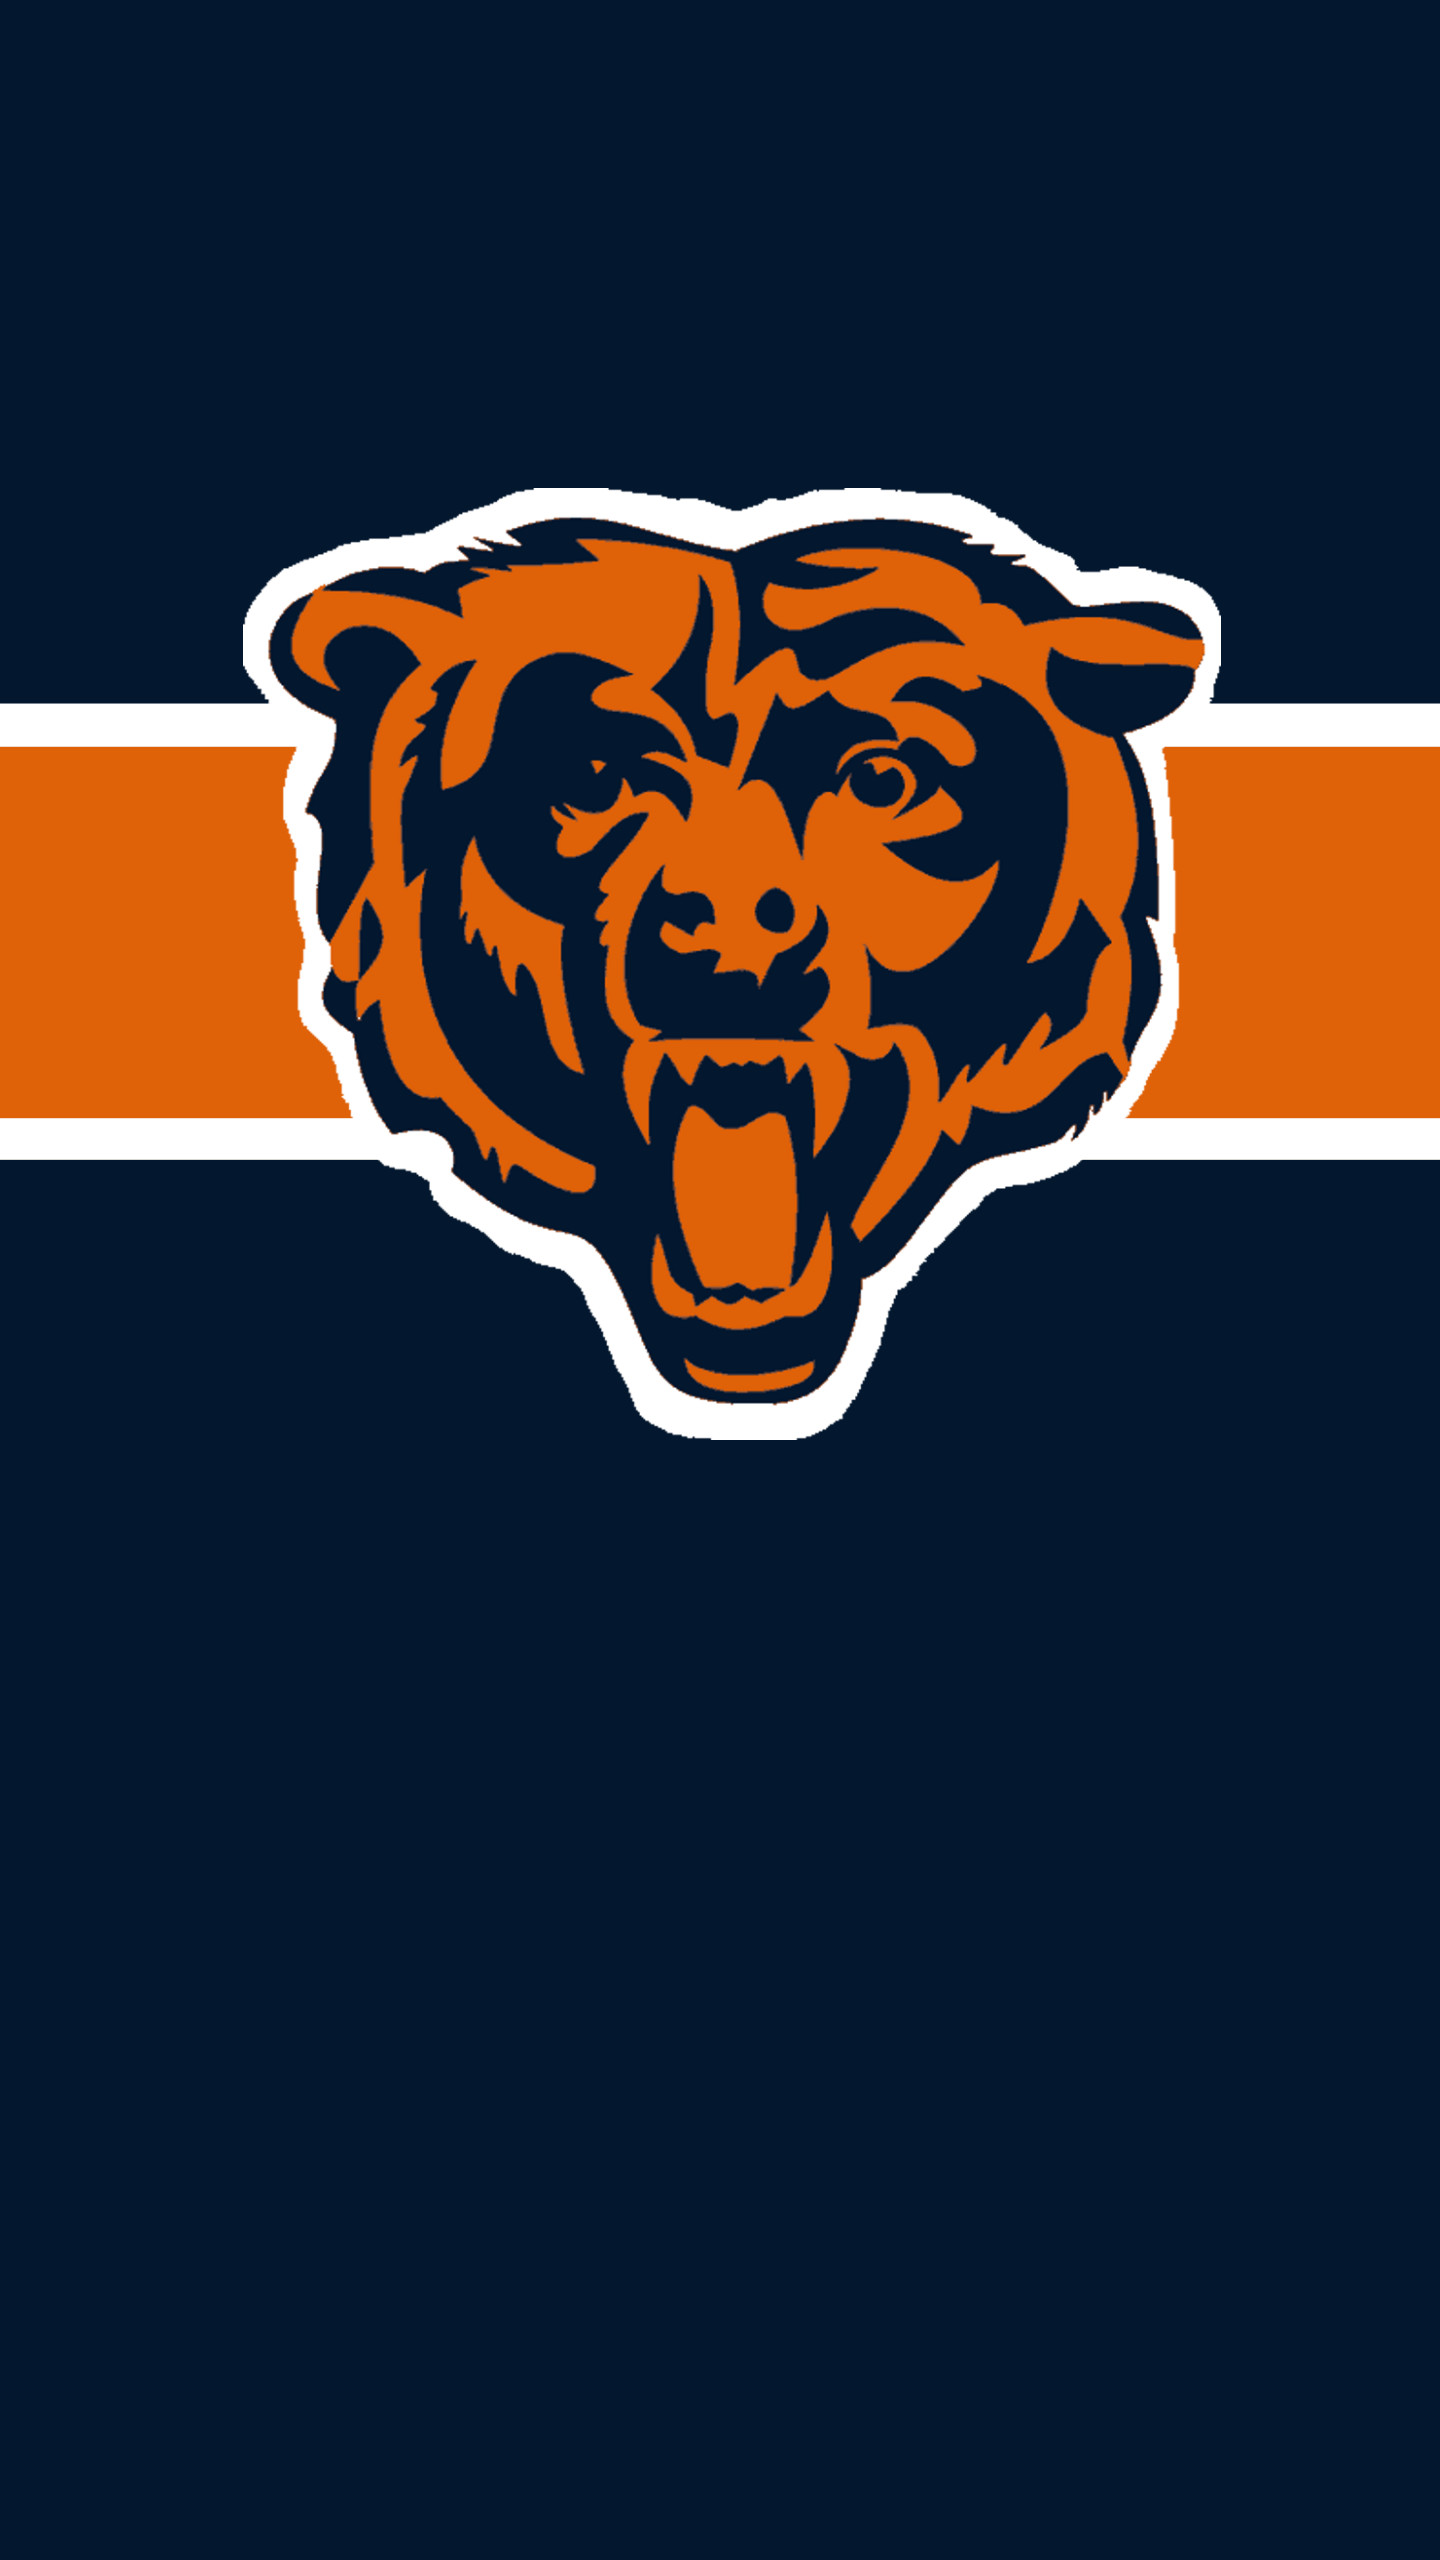 Chicago Bears iPhone Wallpapers – Wallpapercraft